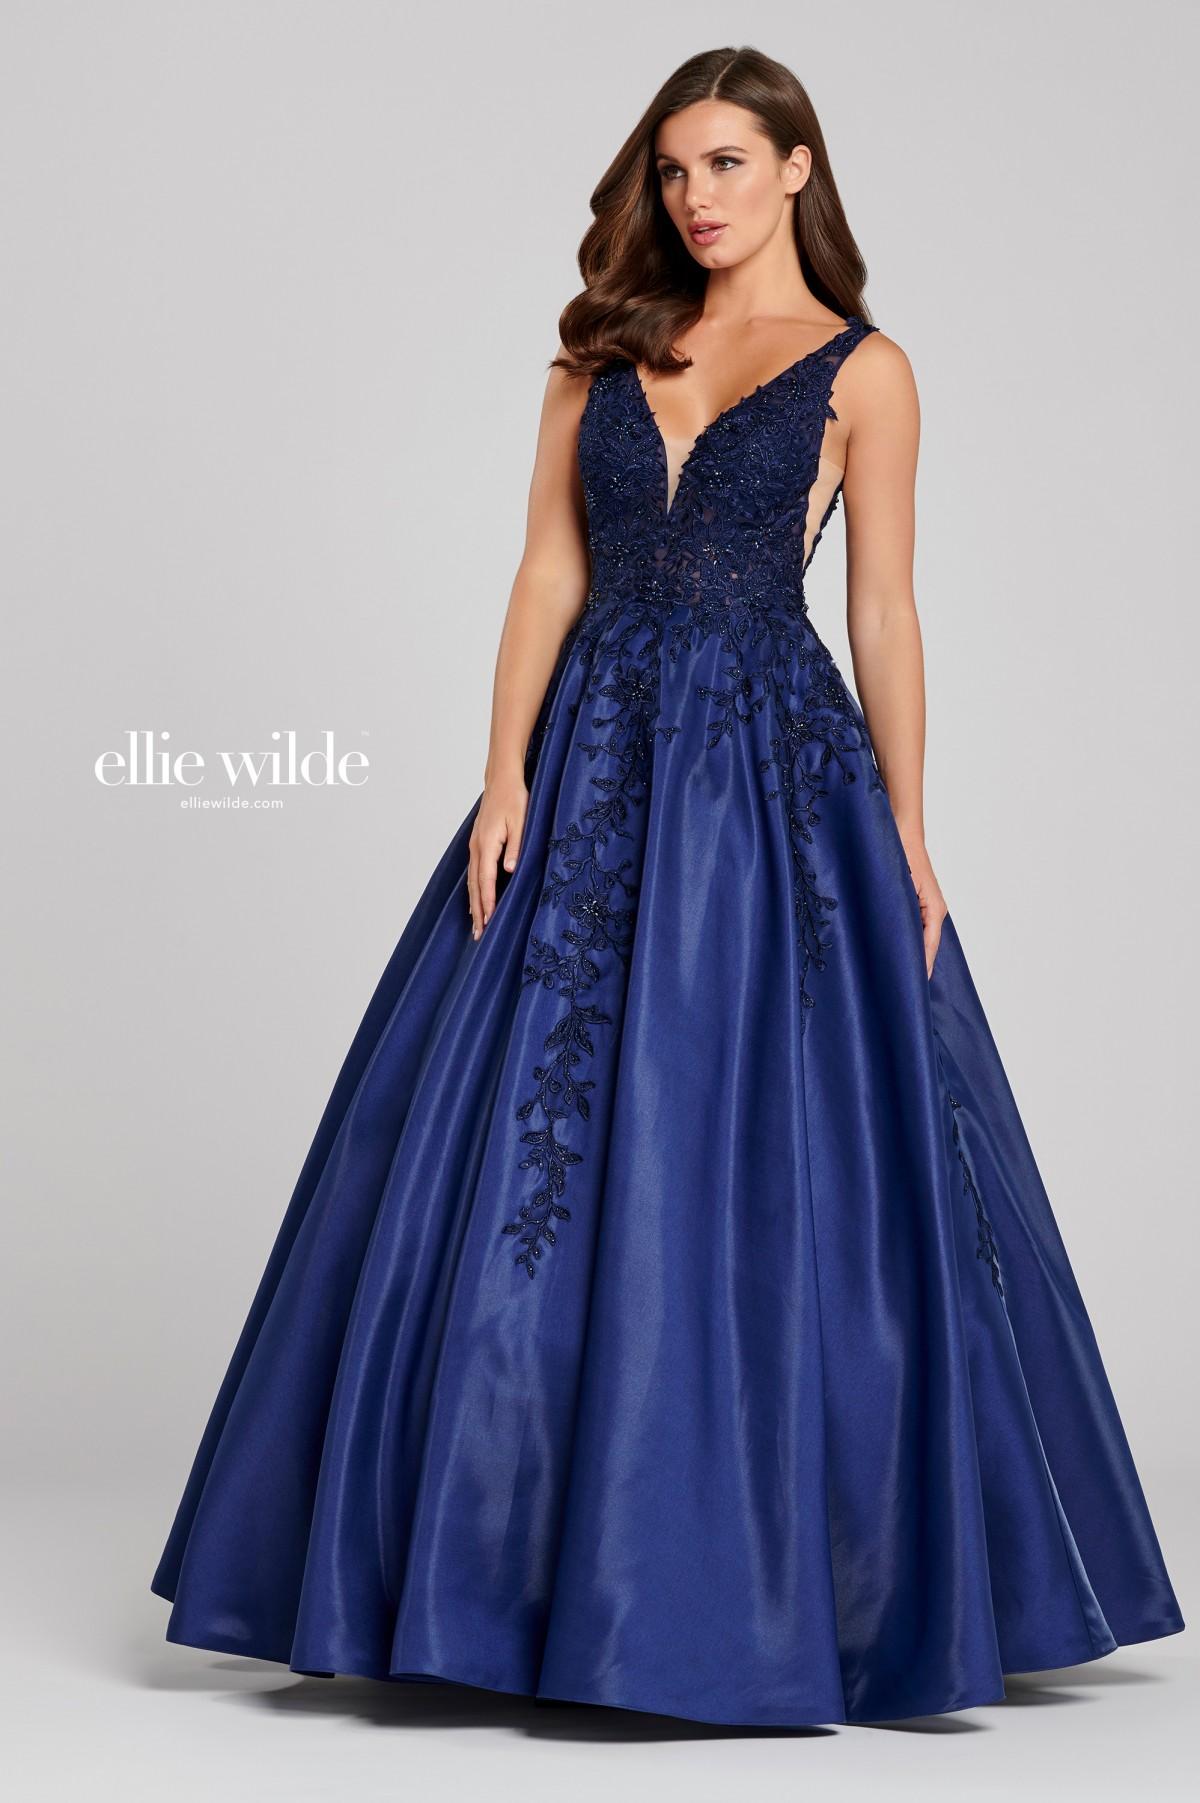 Ellie Wilde  Navy beaded lace ballgown 120115